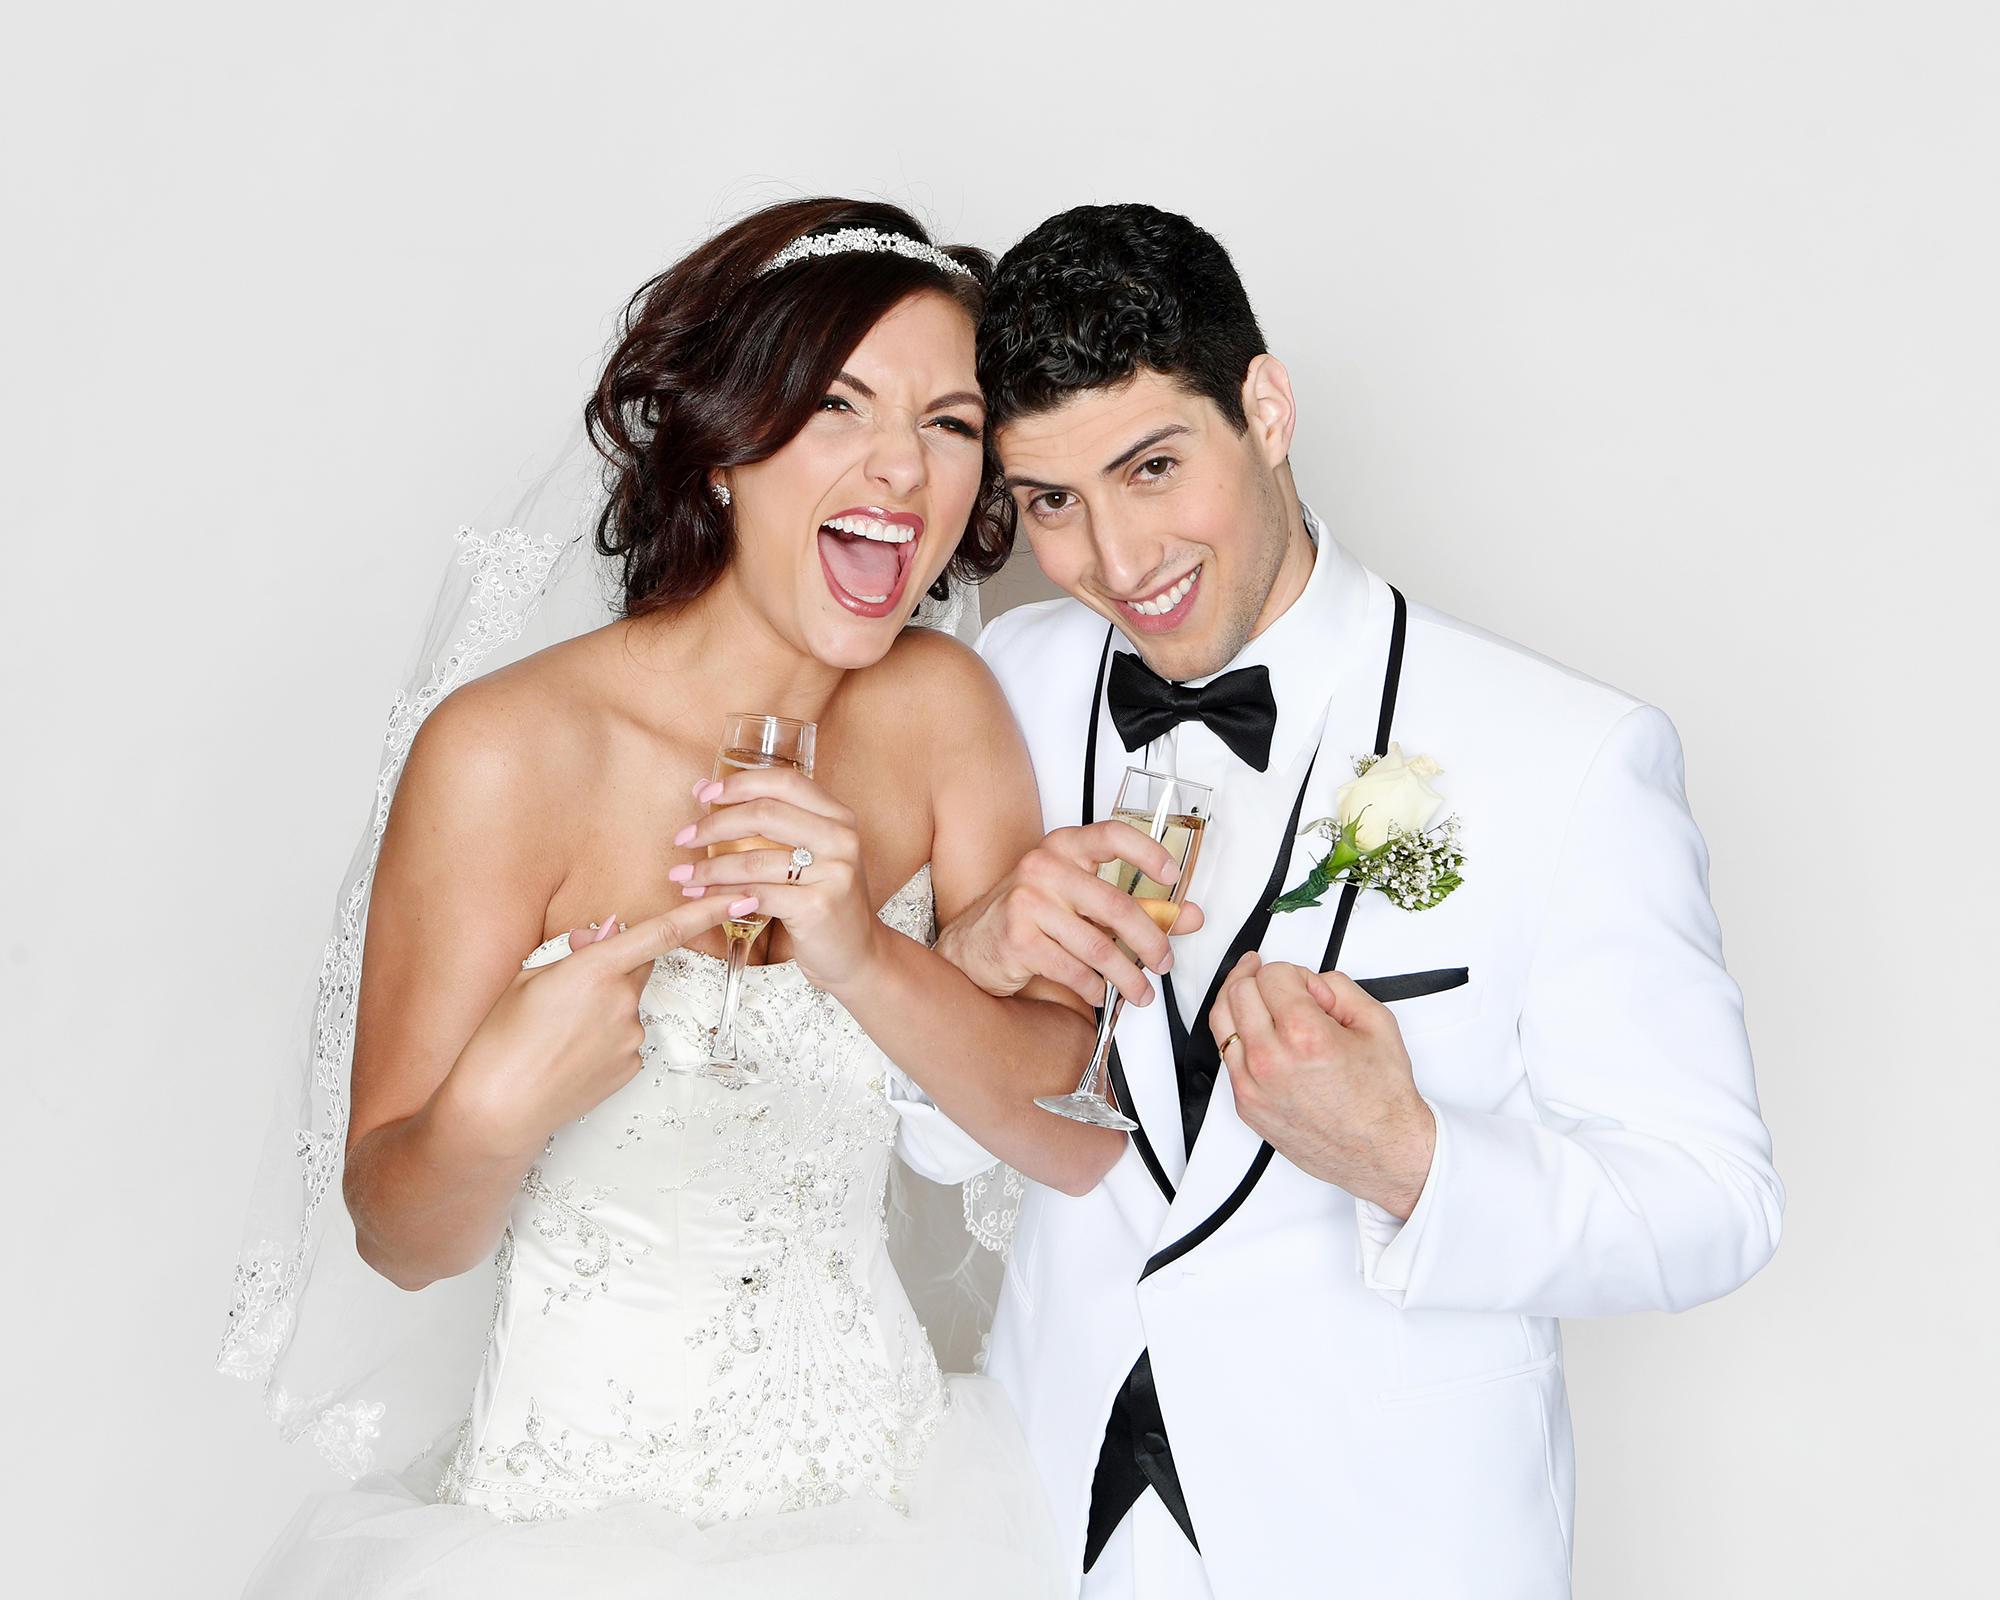 Tony N' Tina's Wedding image 0